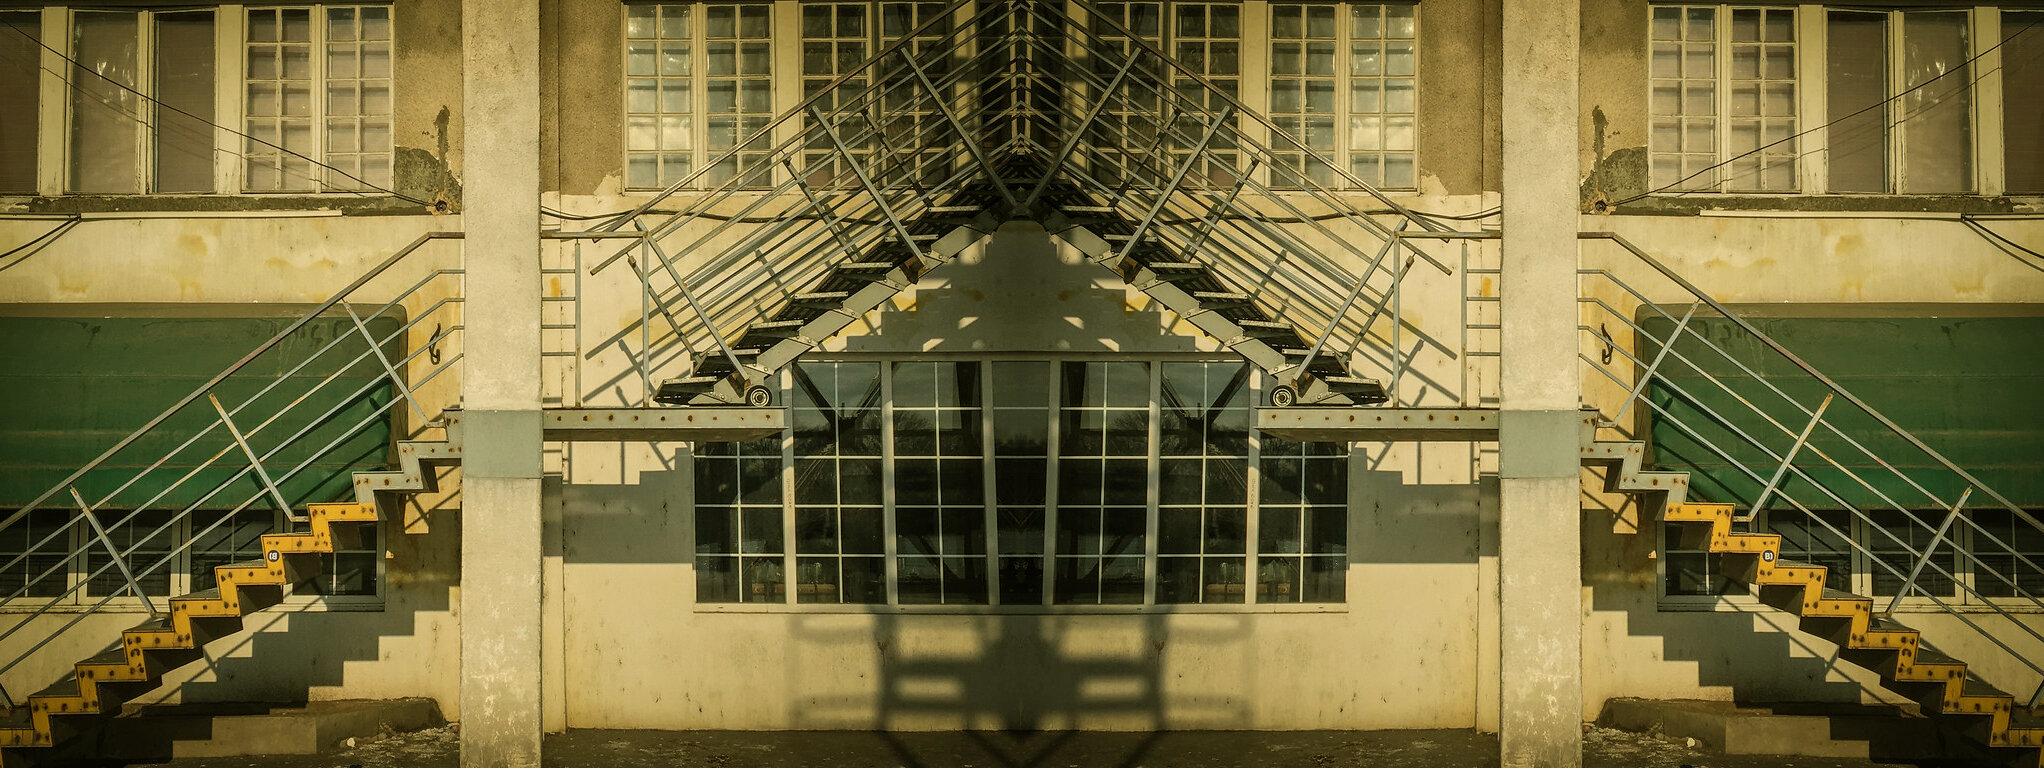 Margot Krasojevic Studio Belgrade 1.jpg